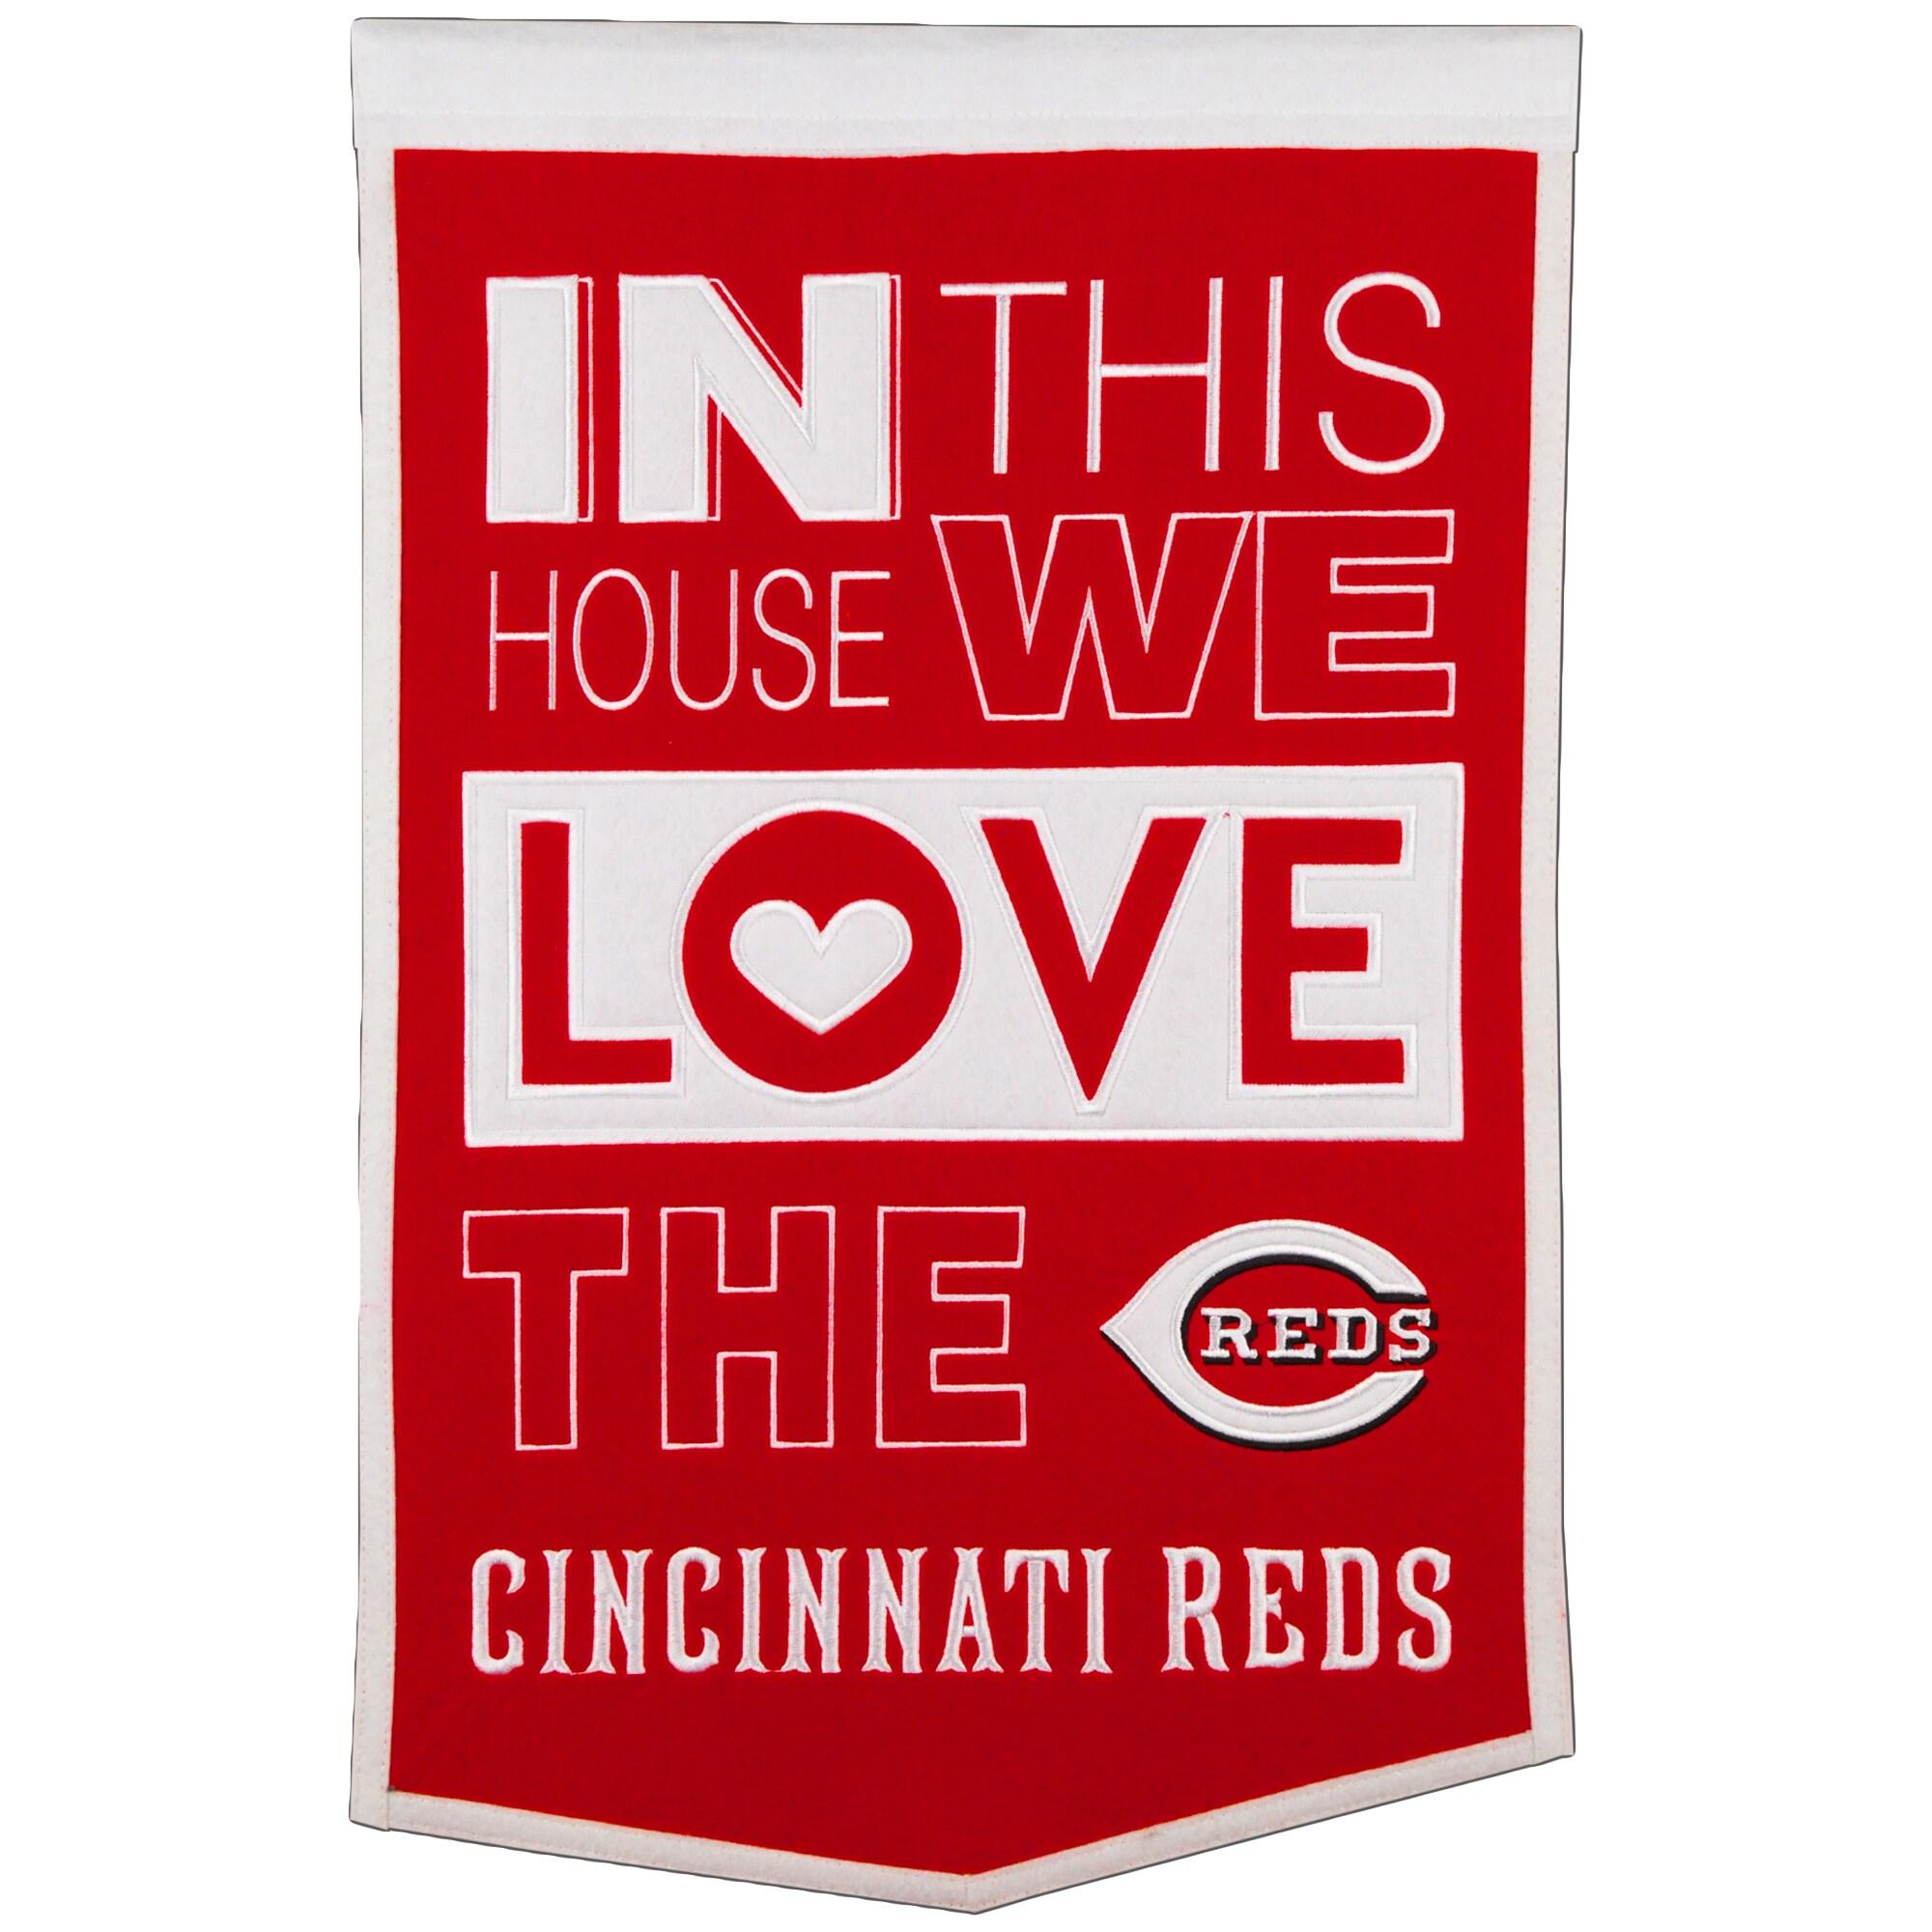 Cincinnati Reds 15'' x 24'' Home Banner - Red/White